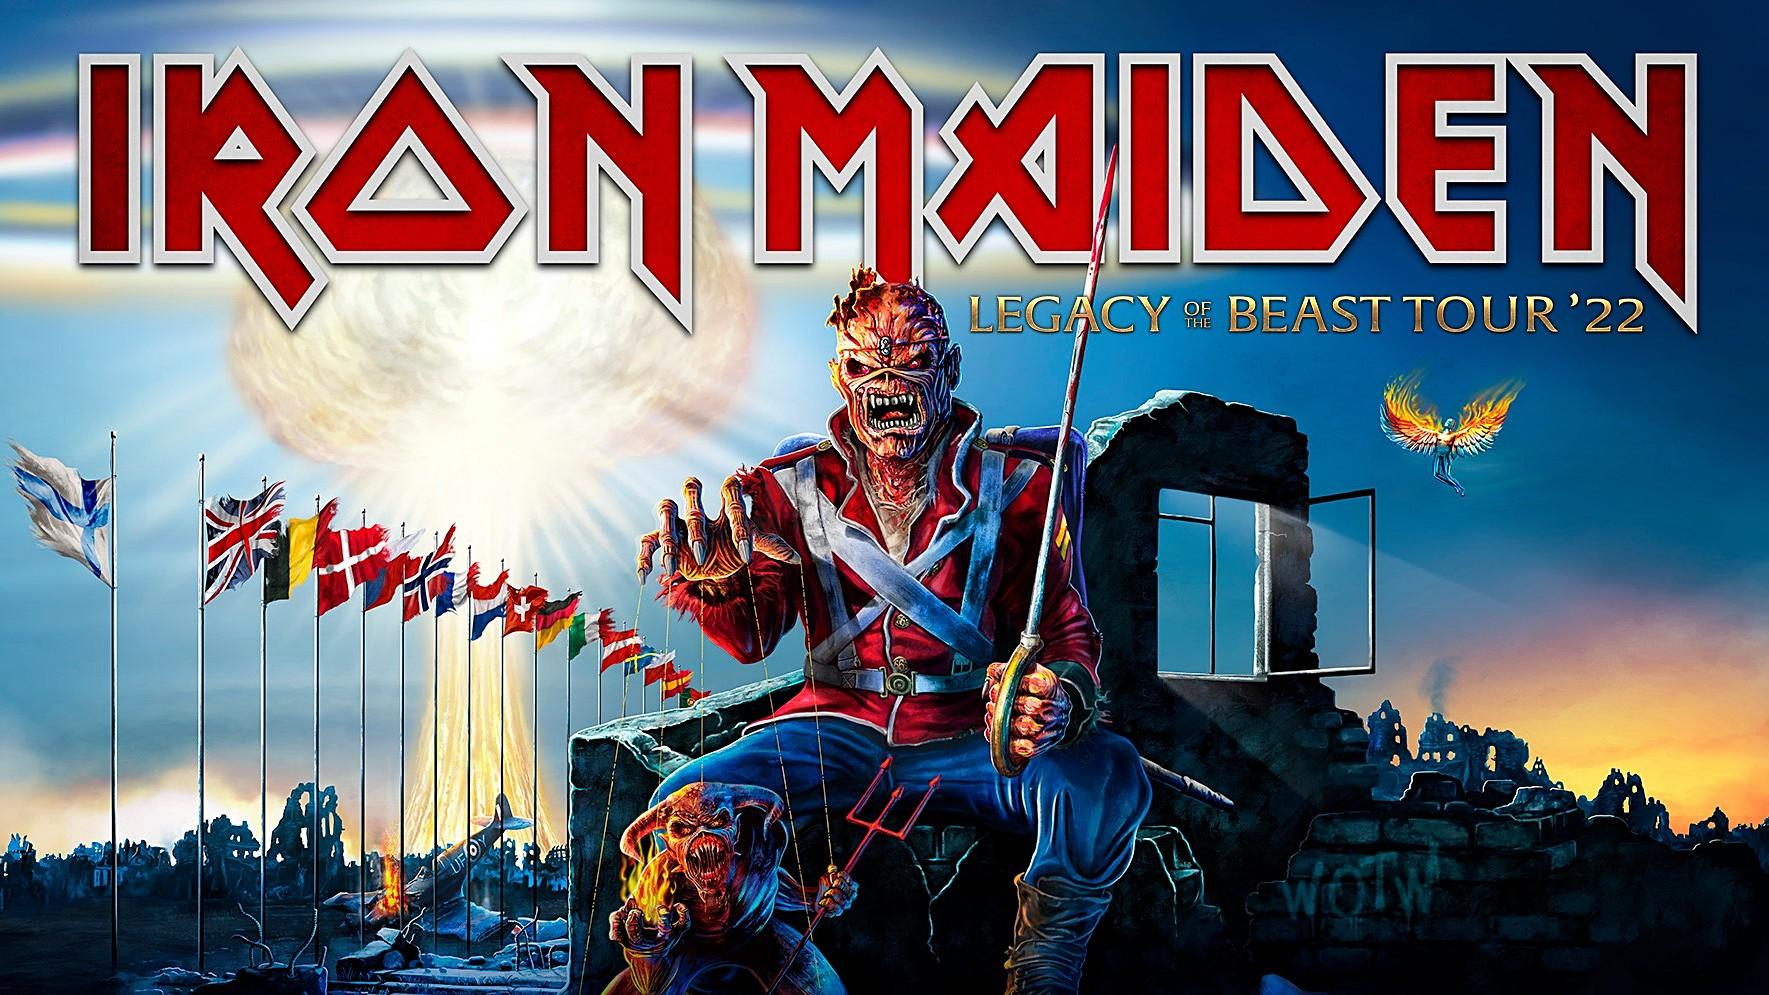 Iron Maiden Legacy Of The Beast Tour 2022